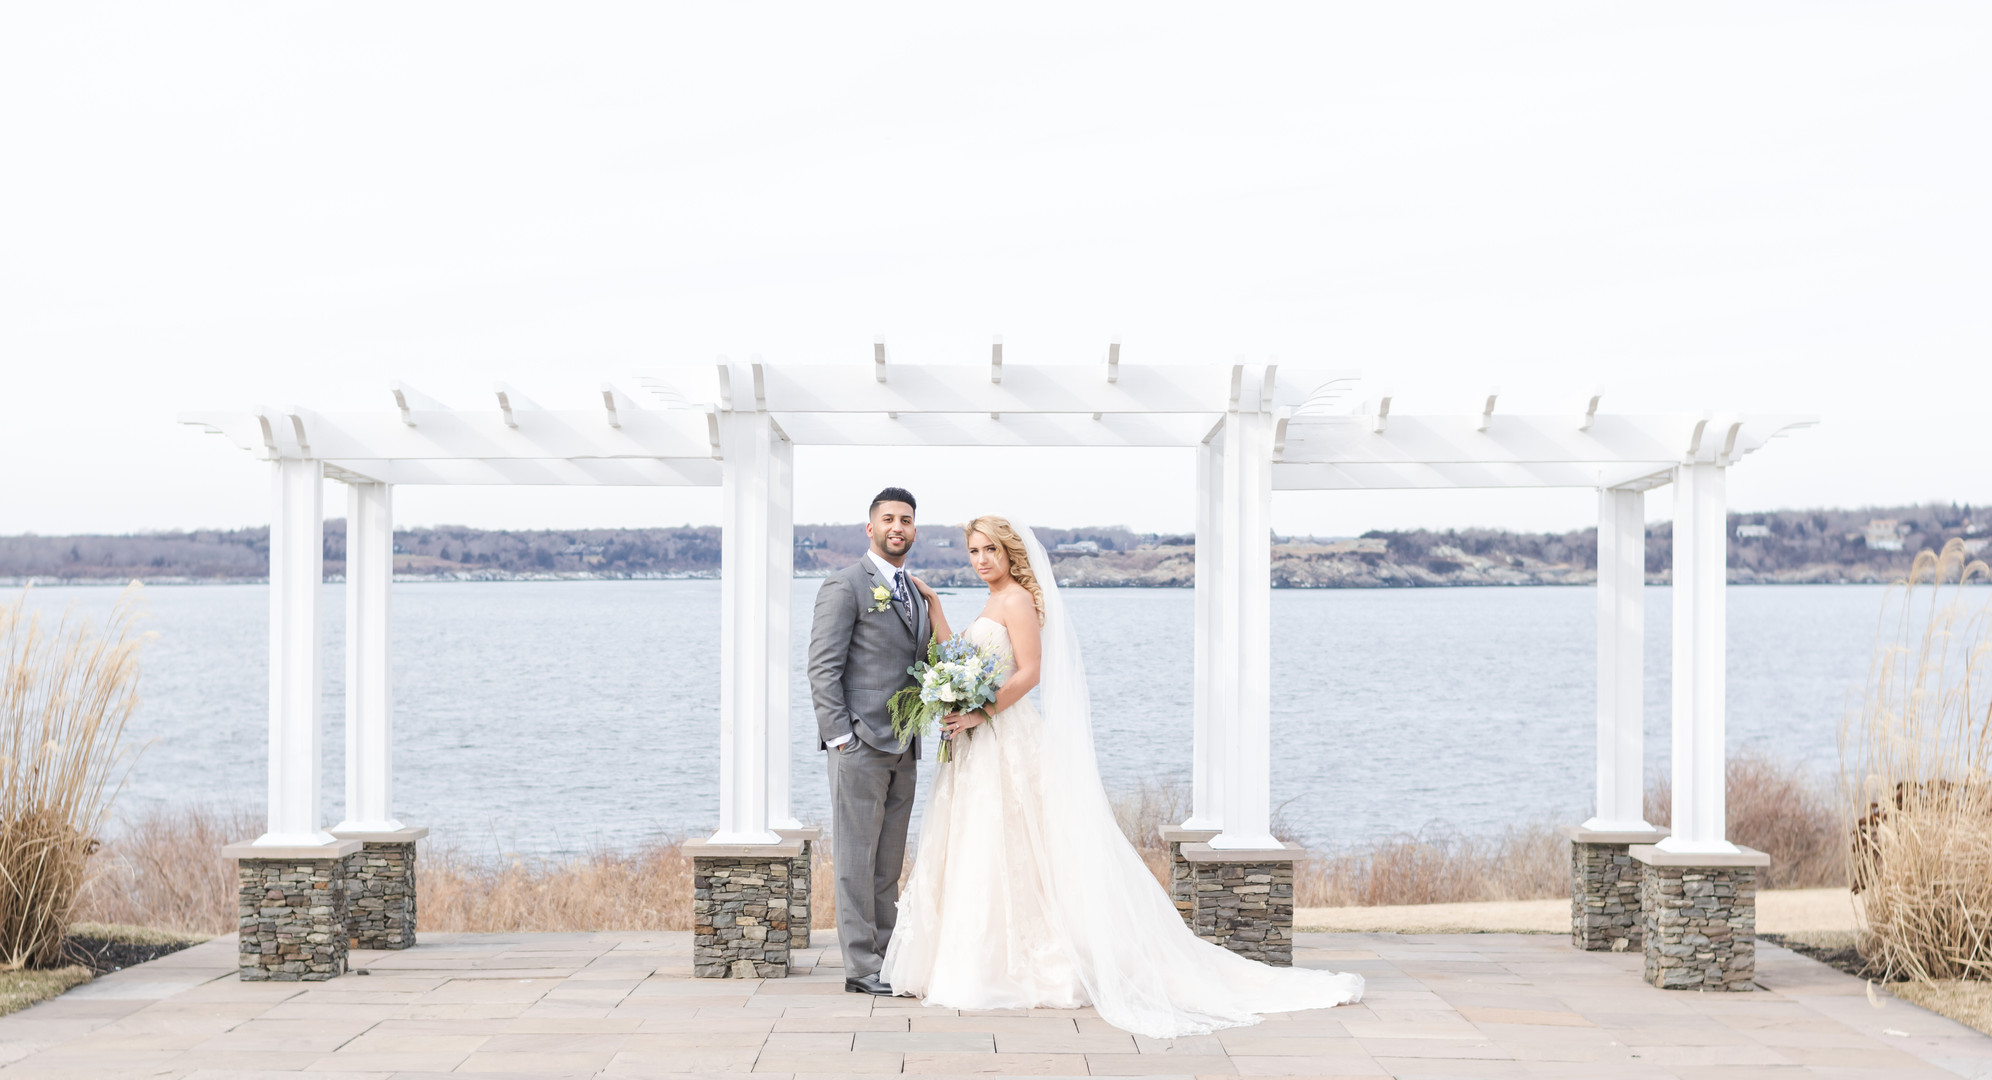 Oceancliff Hotel bride and groom at wedd